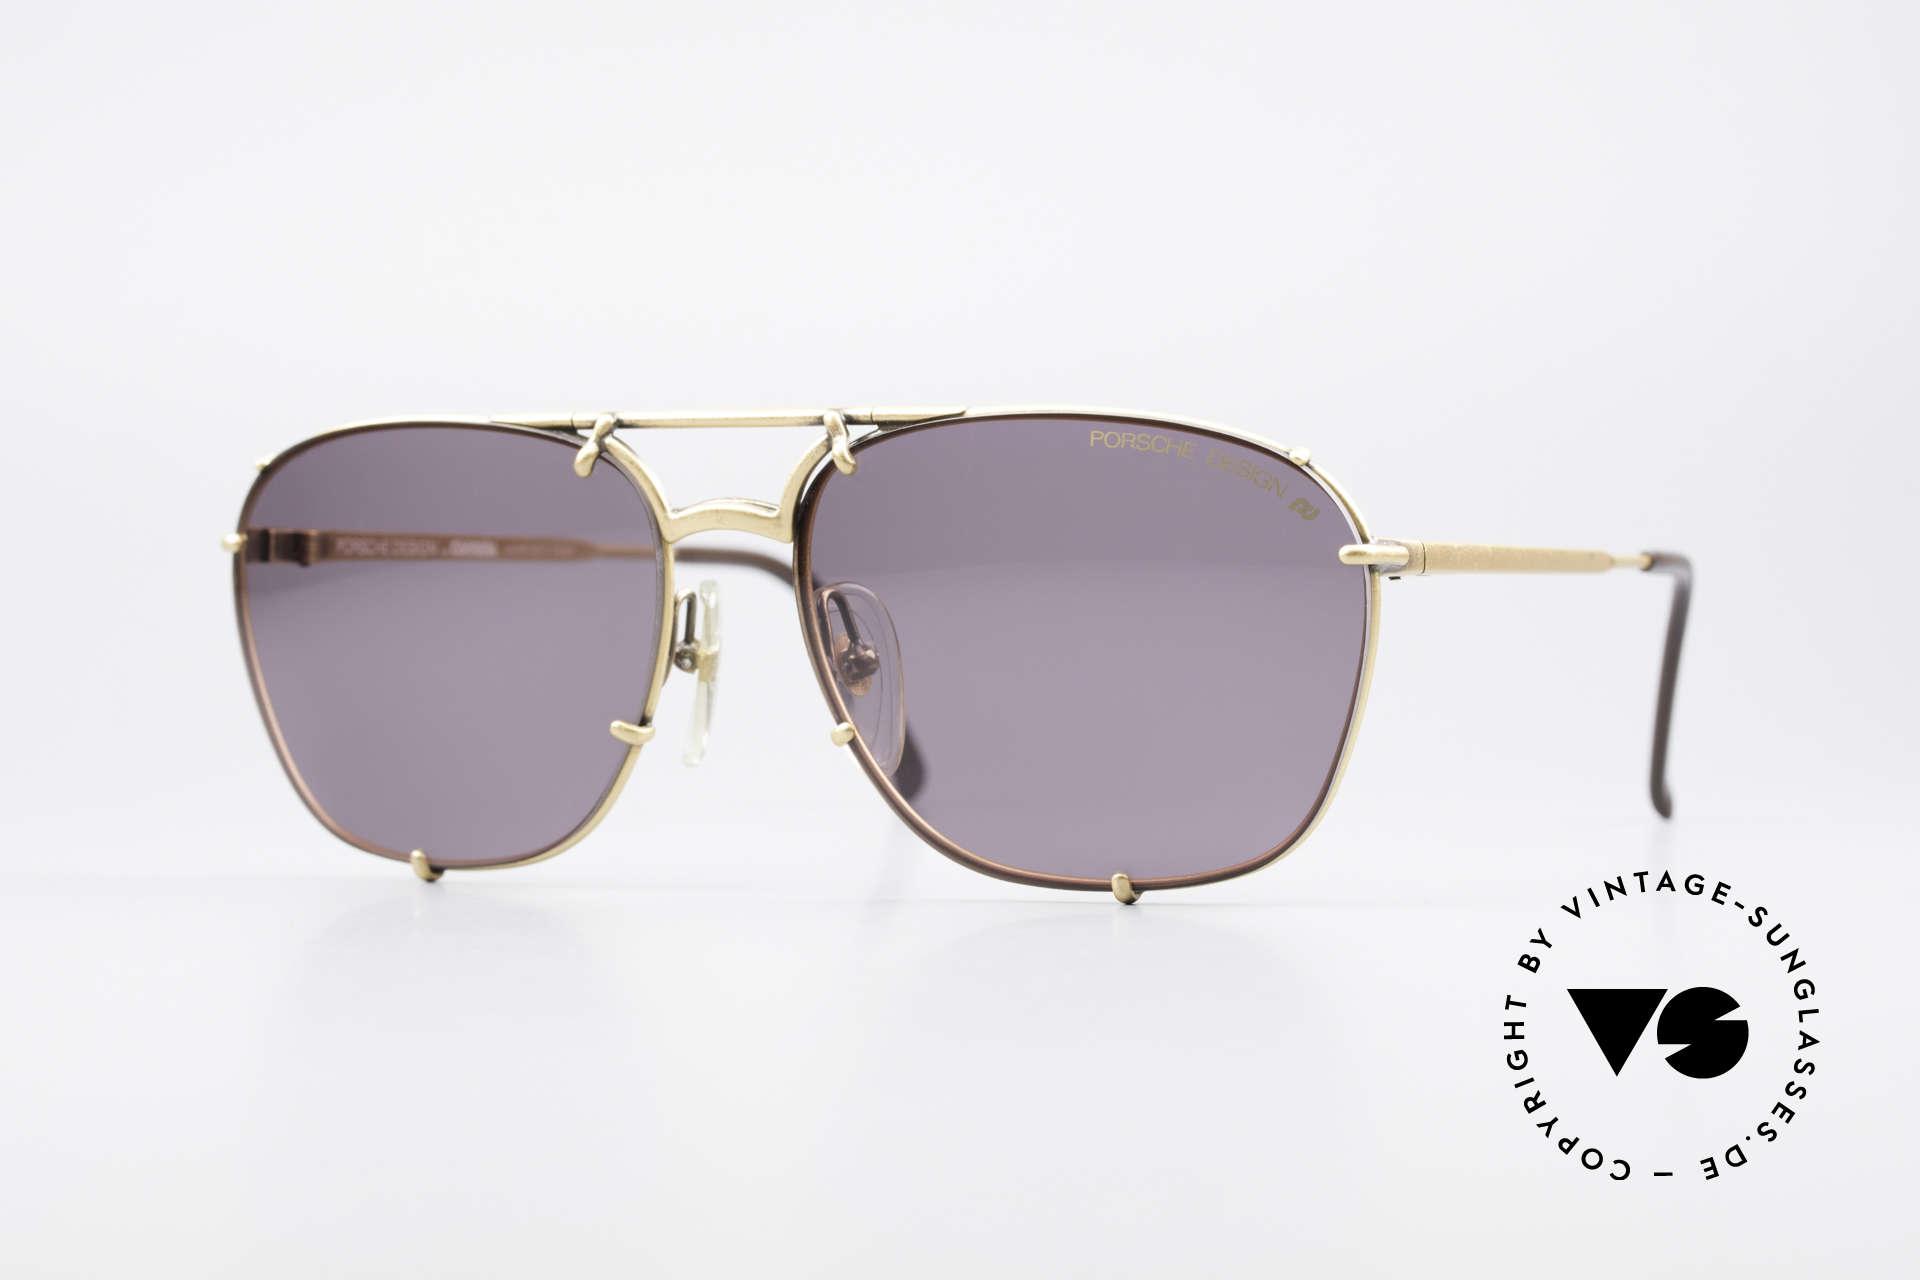 sonnenbrillen porsche 5647 vintage sonnenbrille herren vintage sunglasses. Black Bedroom Furniture Sets. Home Design Ideas